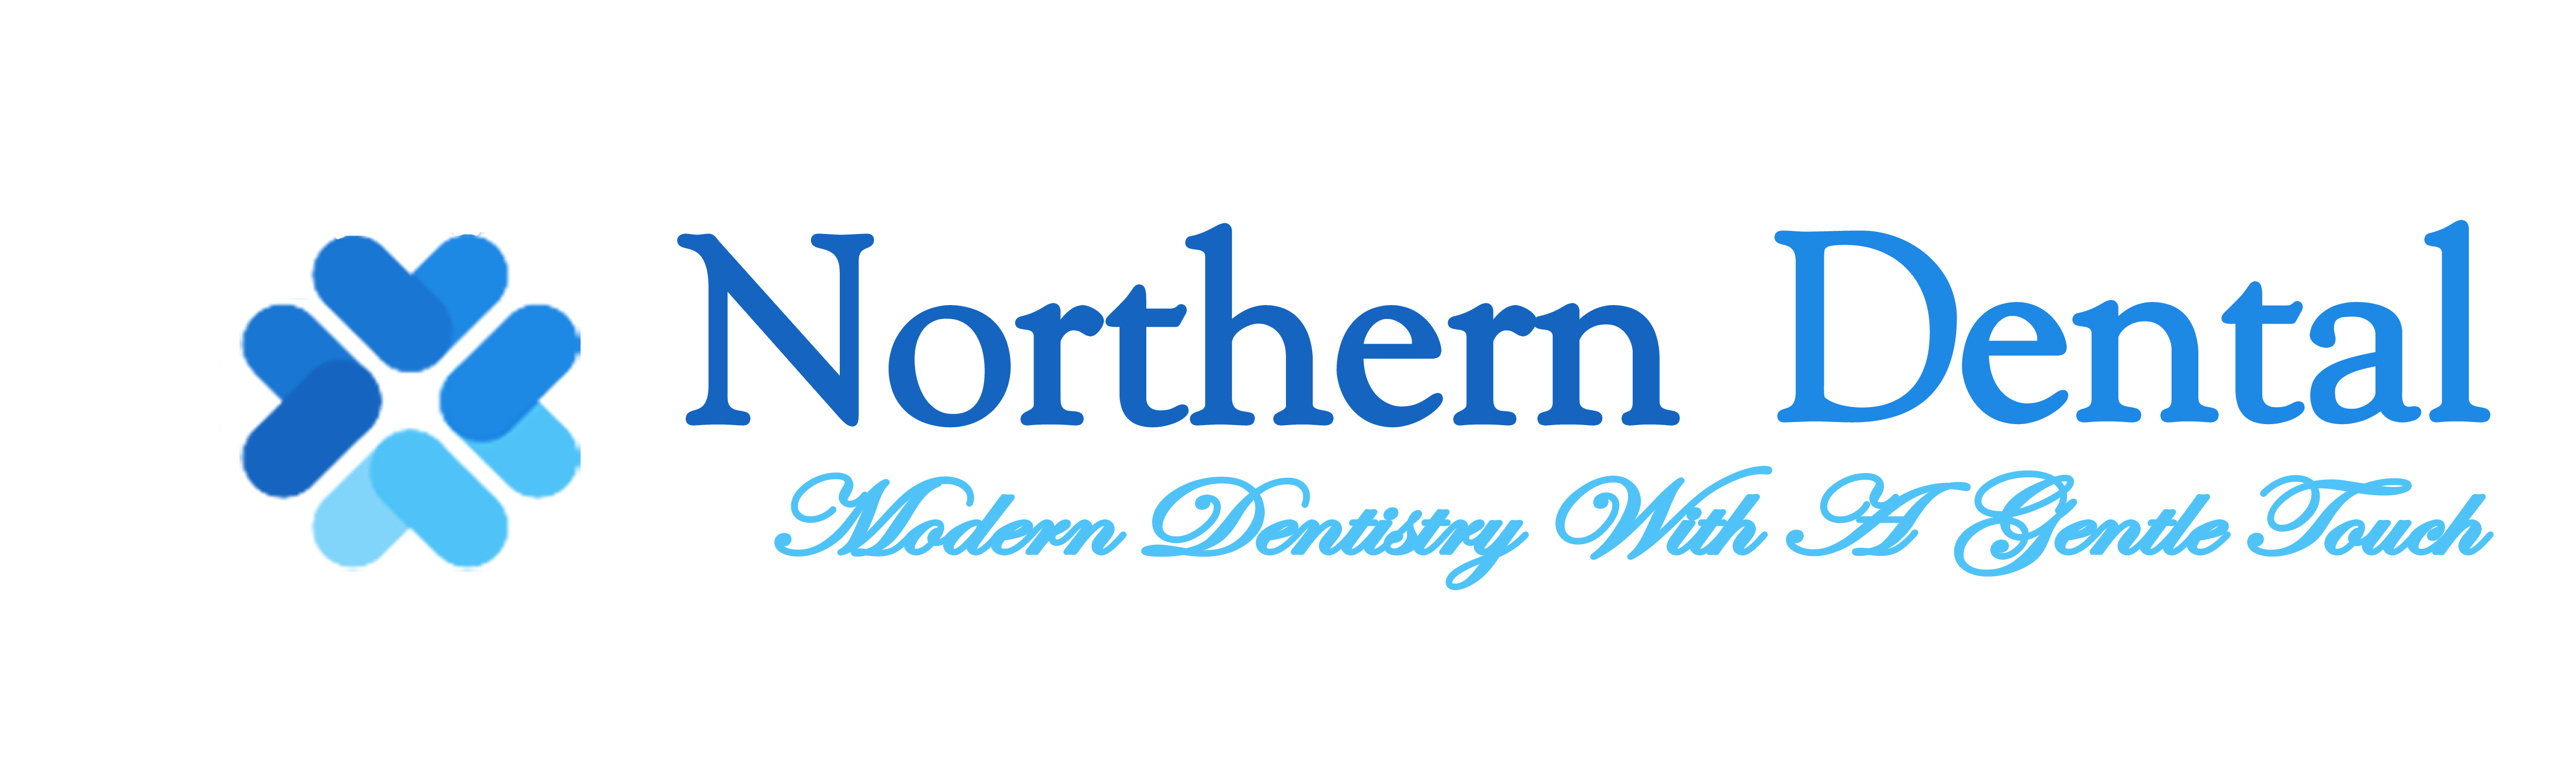 Northern Dental